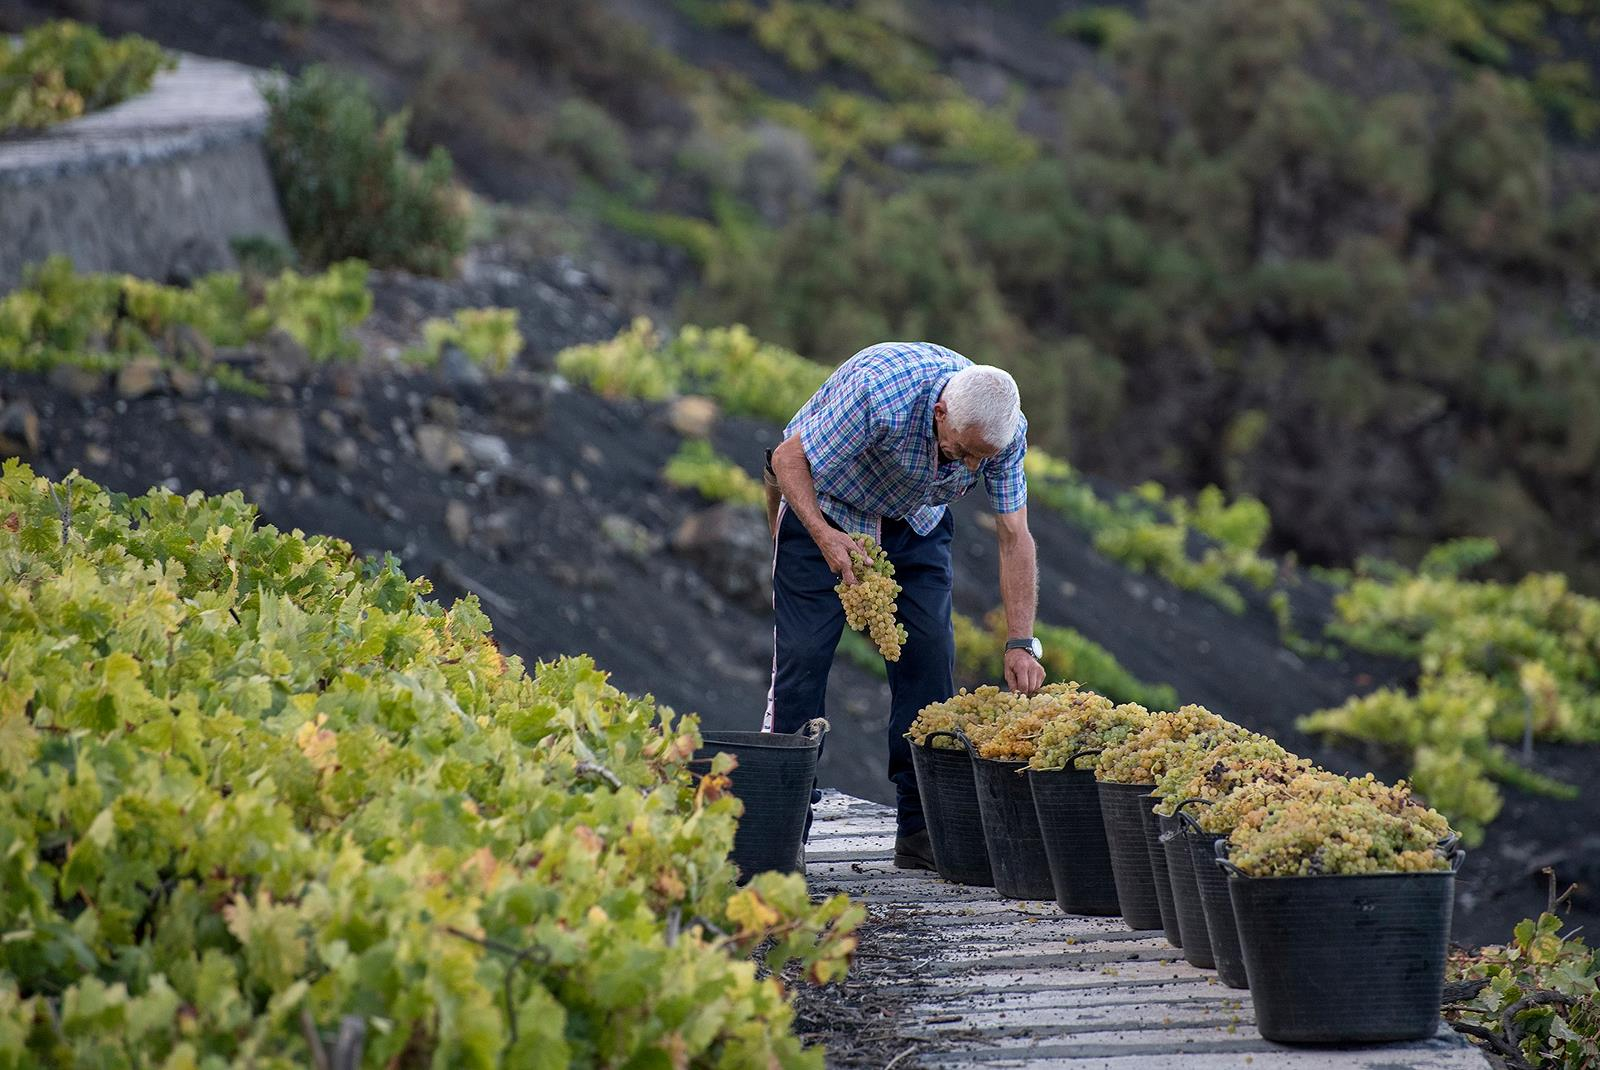 Visit-Bodegas-Teneguia-winery-with-wine-Tasting-2